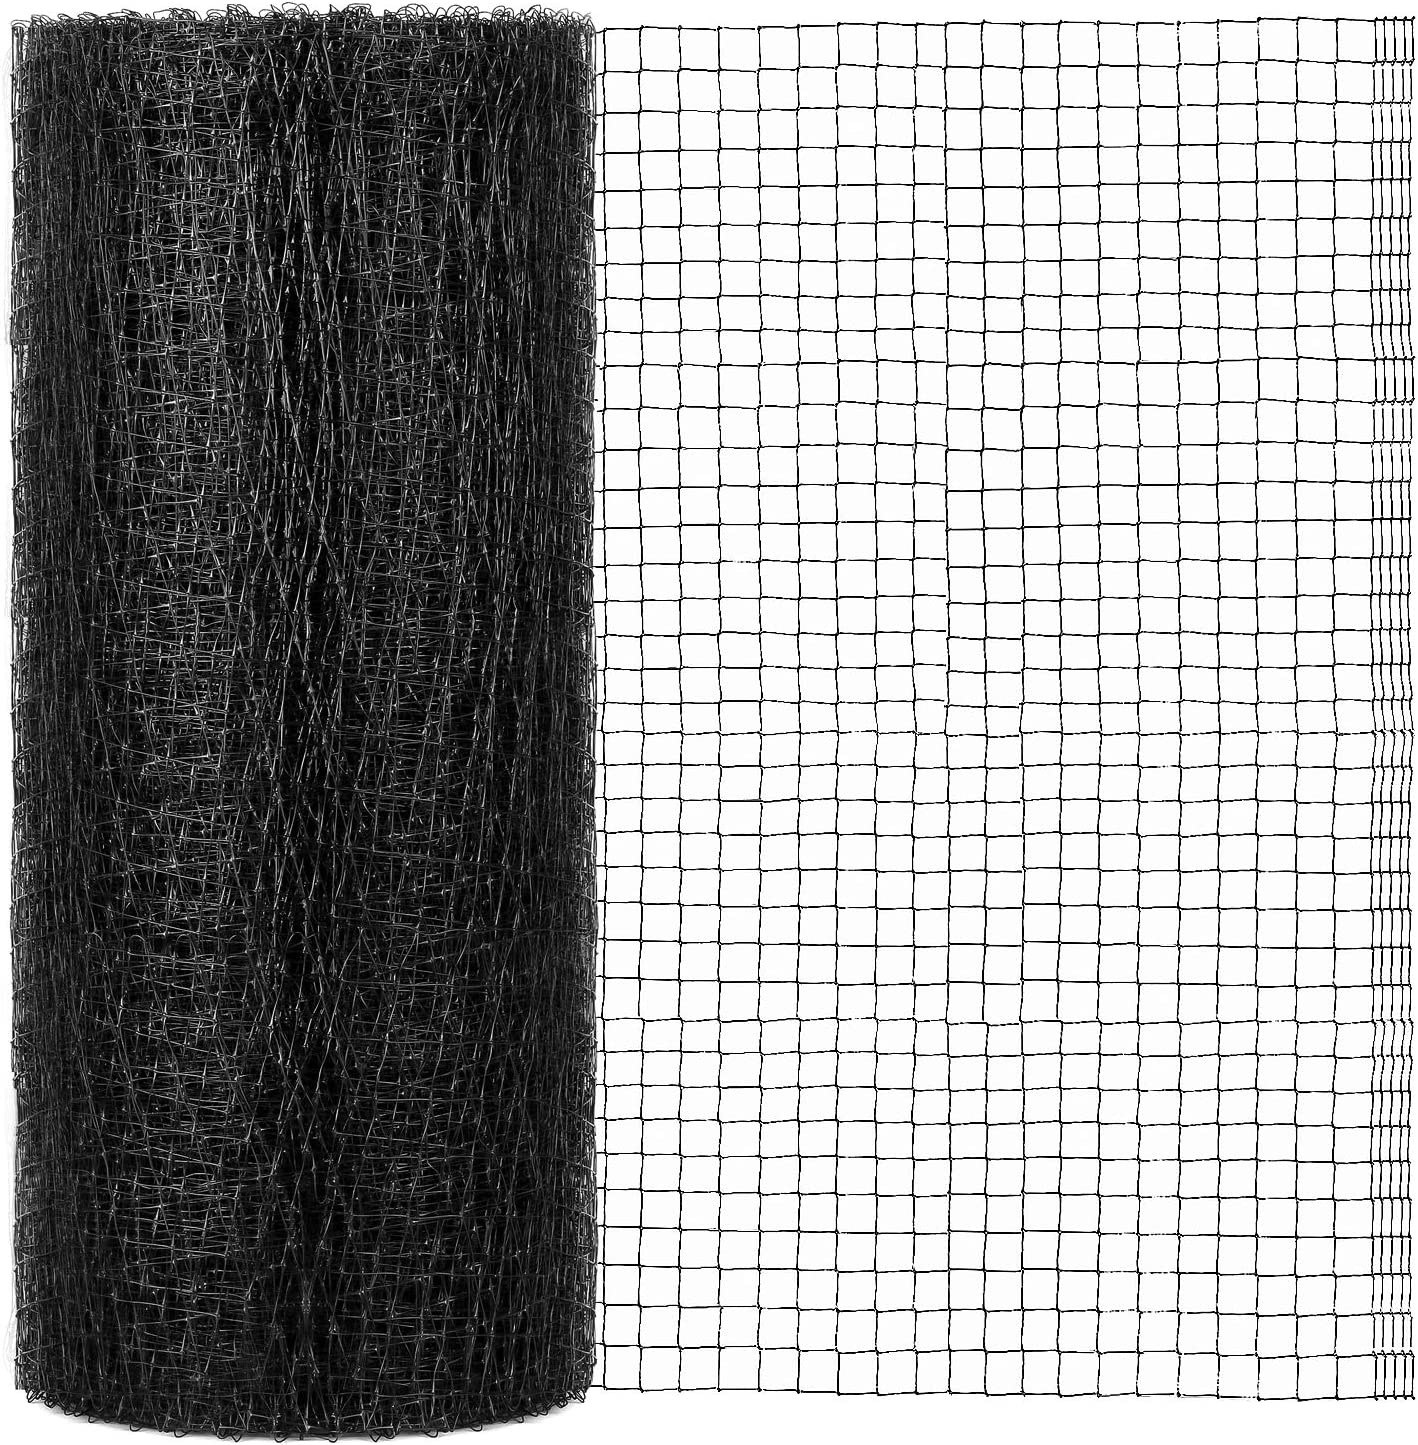 VIVOSUN Anti Bird Netting 7.5' x 65' Heavy Duty Garden Plant Netting